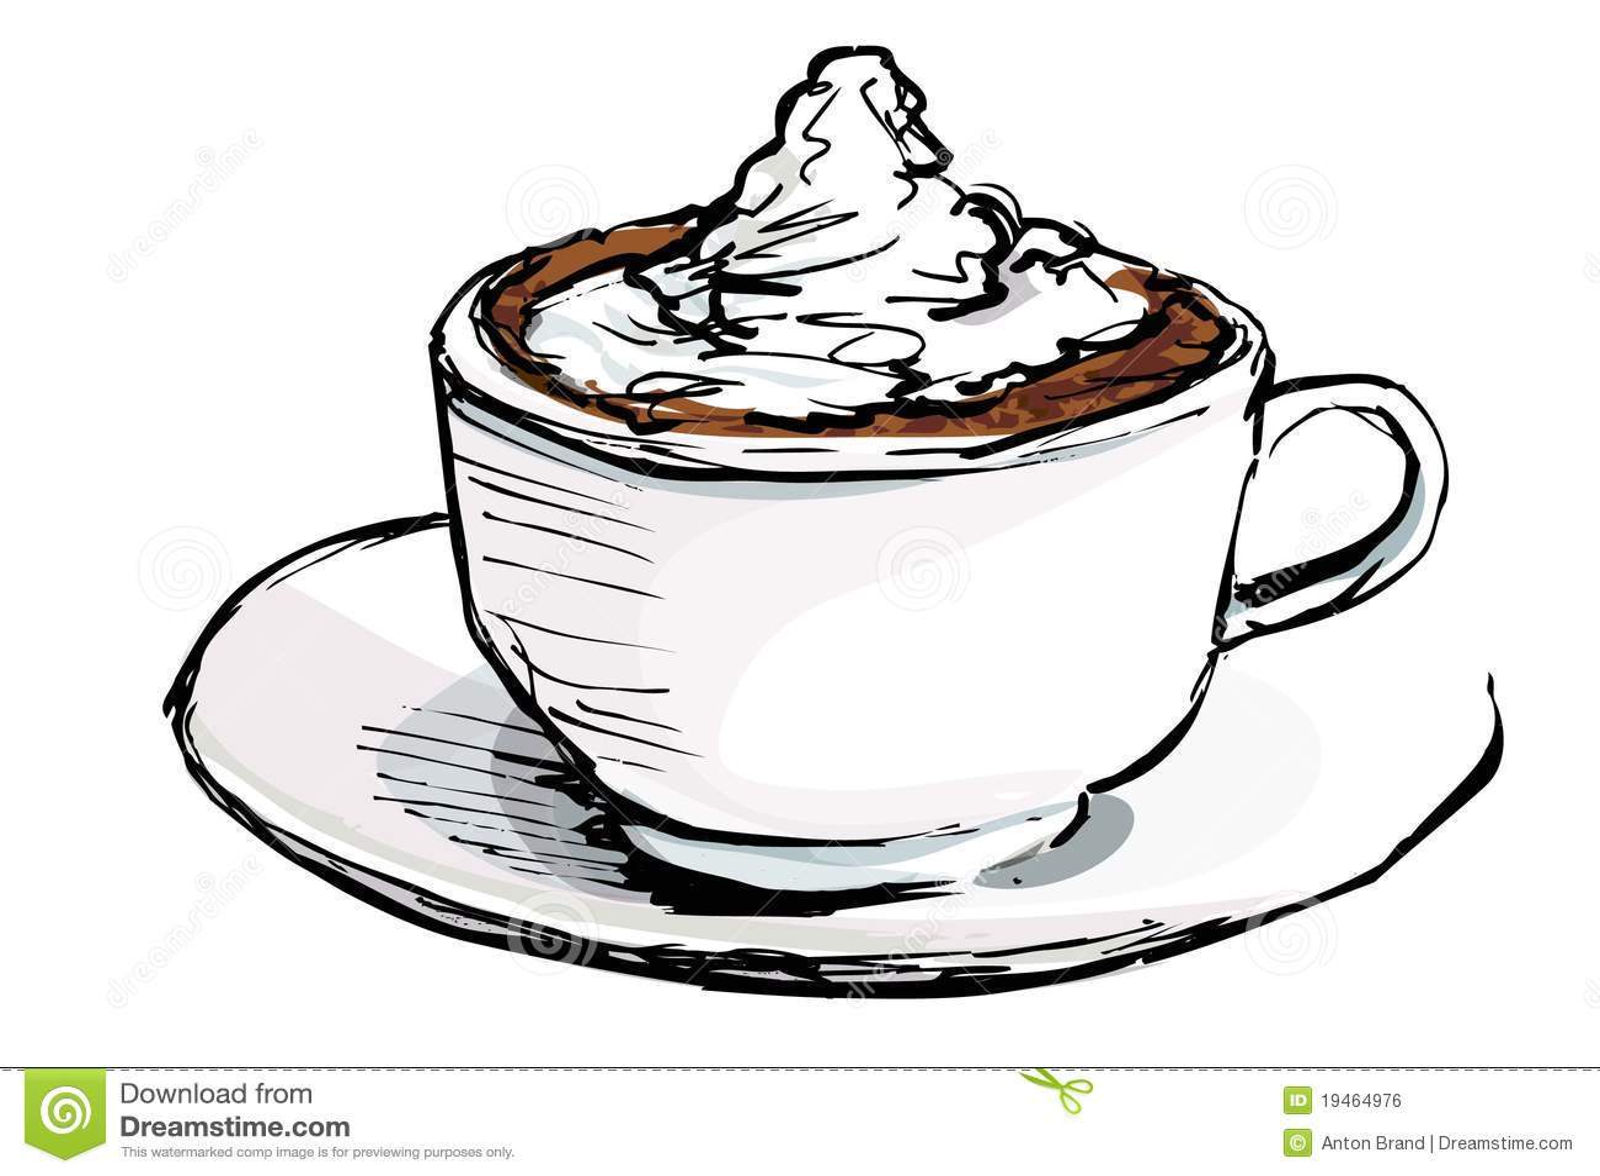 coffee creamer clipart - photo #39